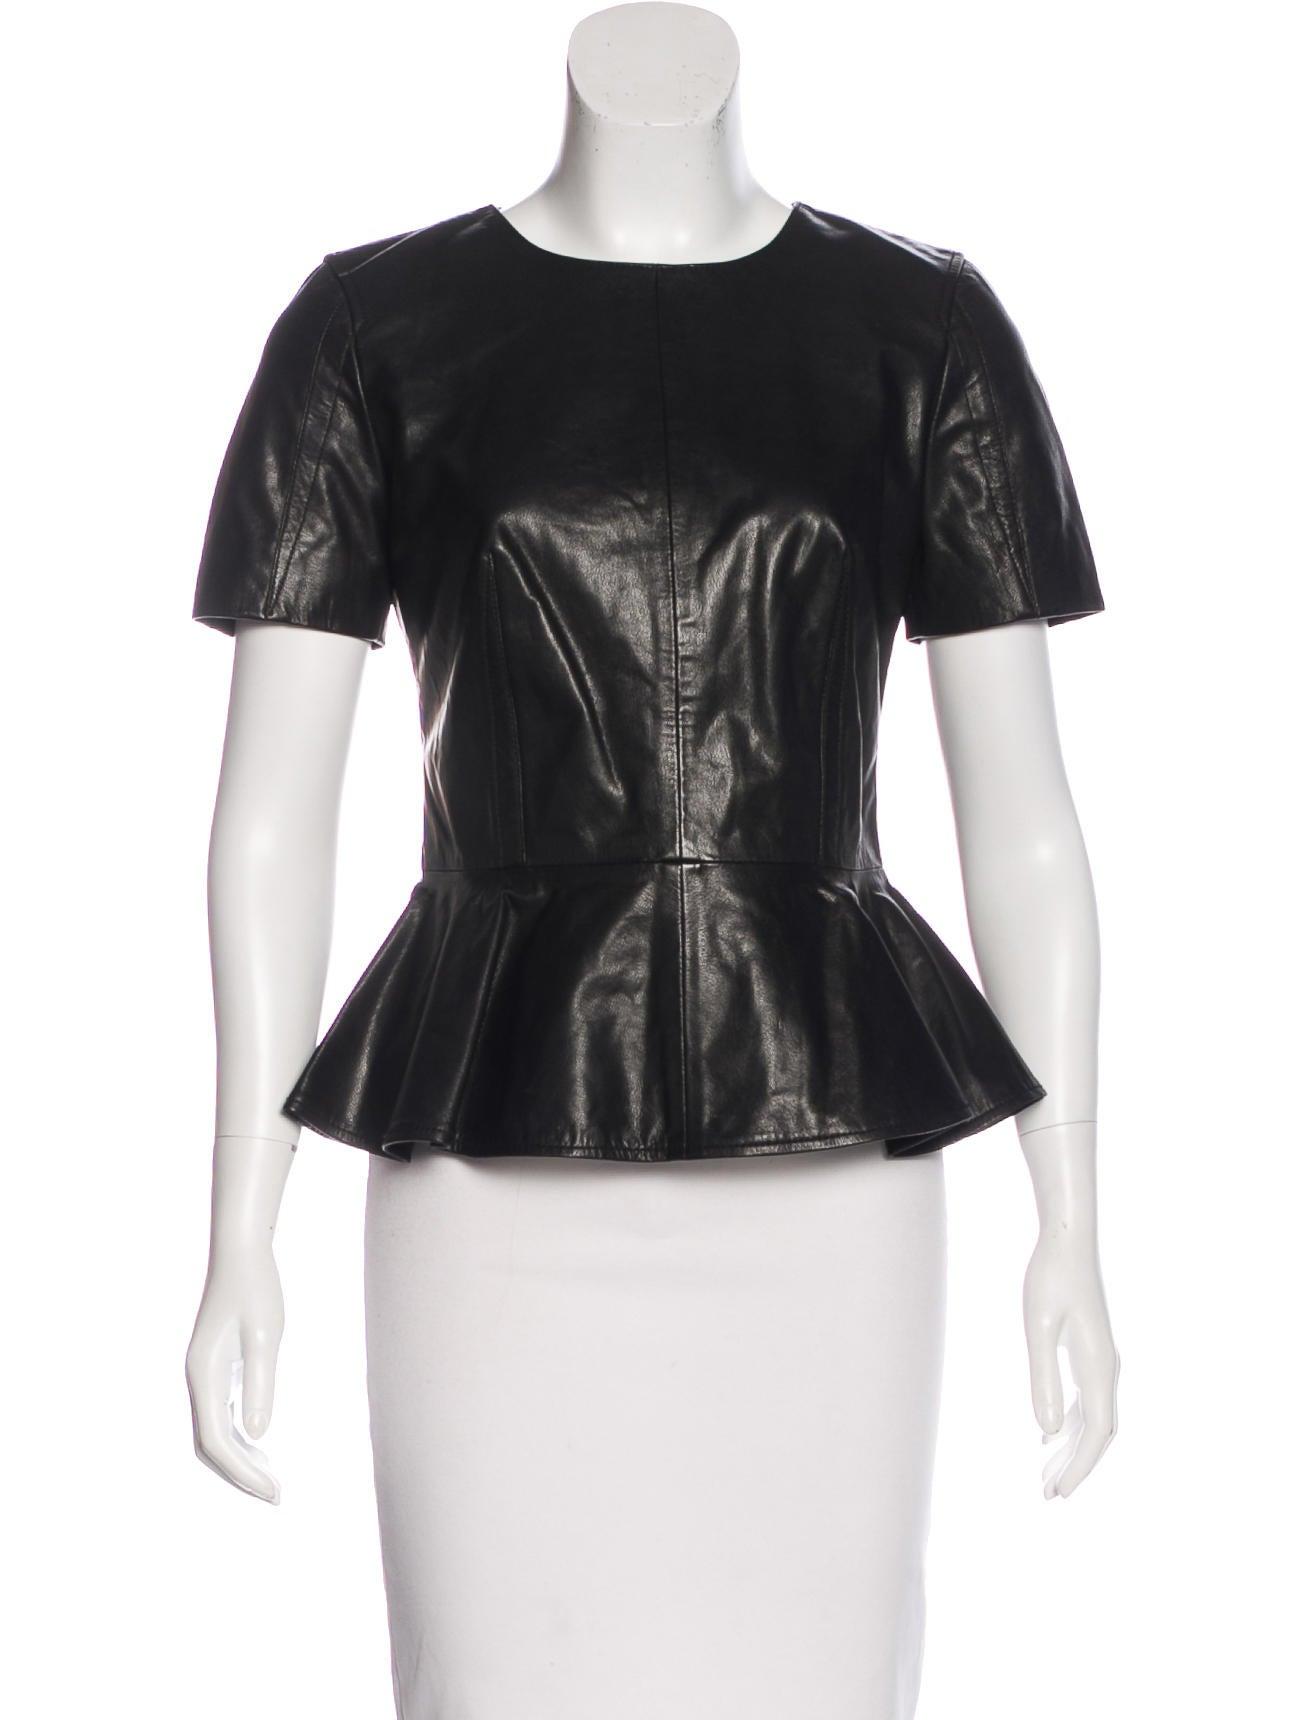 Faux Leather shirt jaket 50% PU 50% POLYESTER 1X Size 2x Size 3X Size